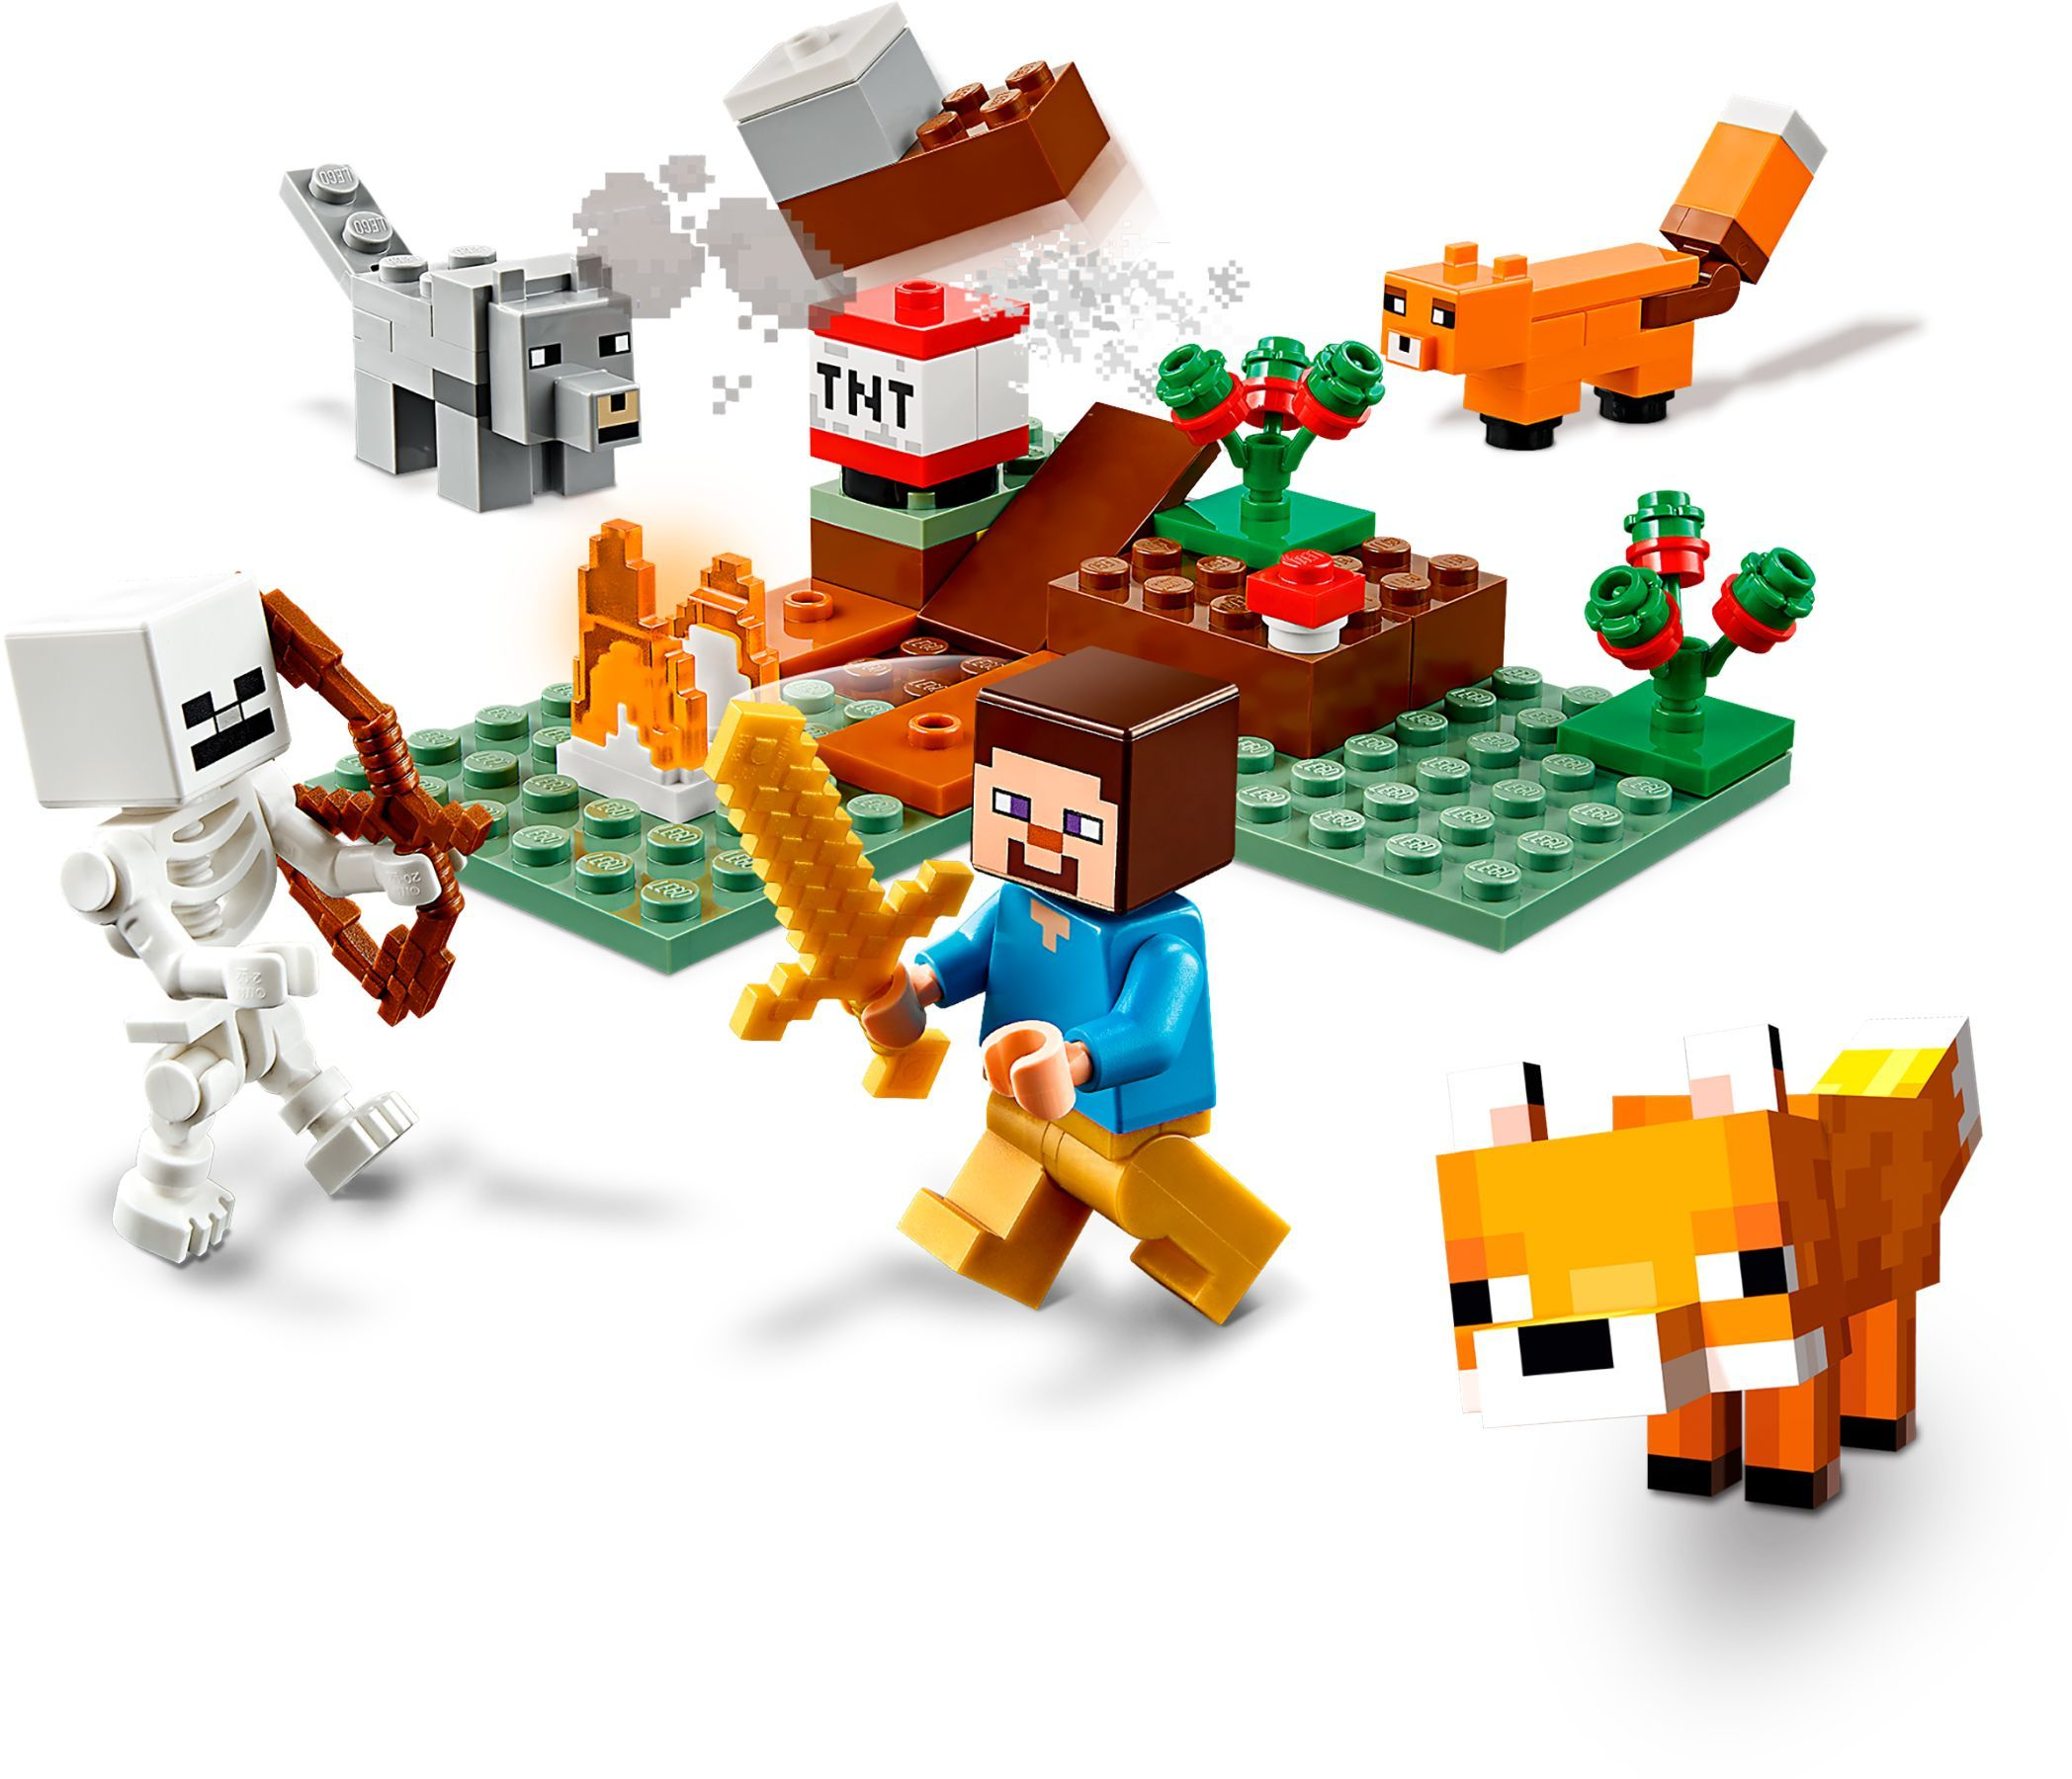 21162 LEGO Minecraft The Taiga Adventure